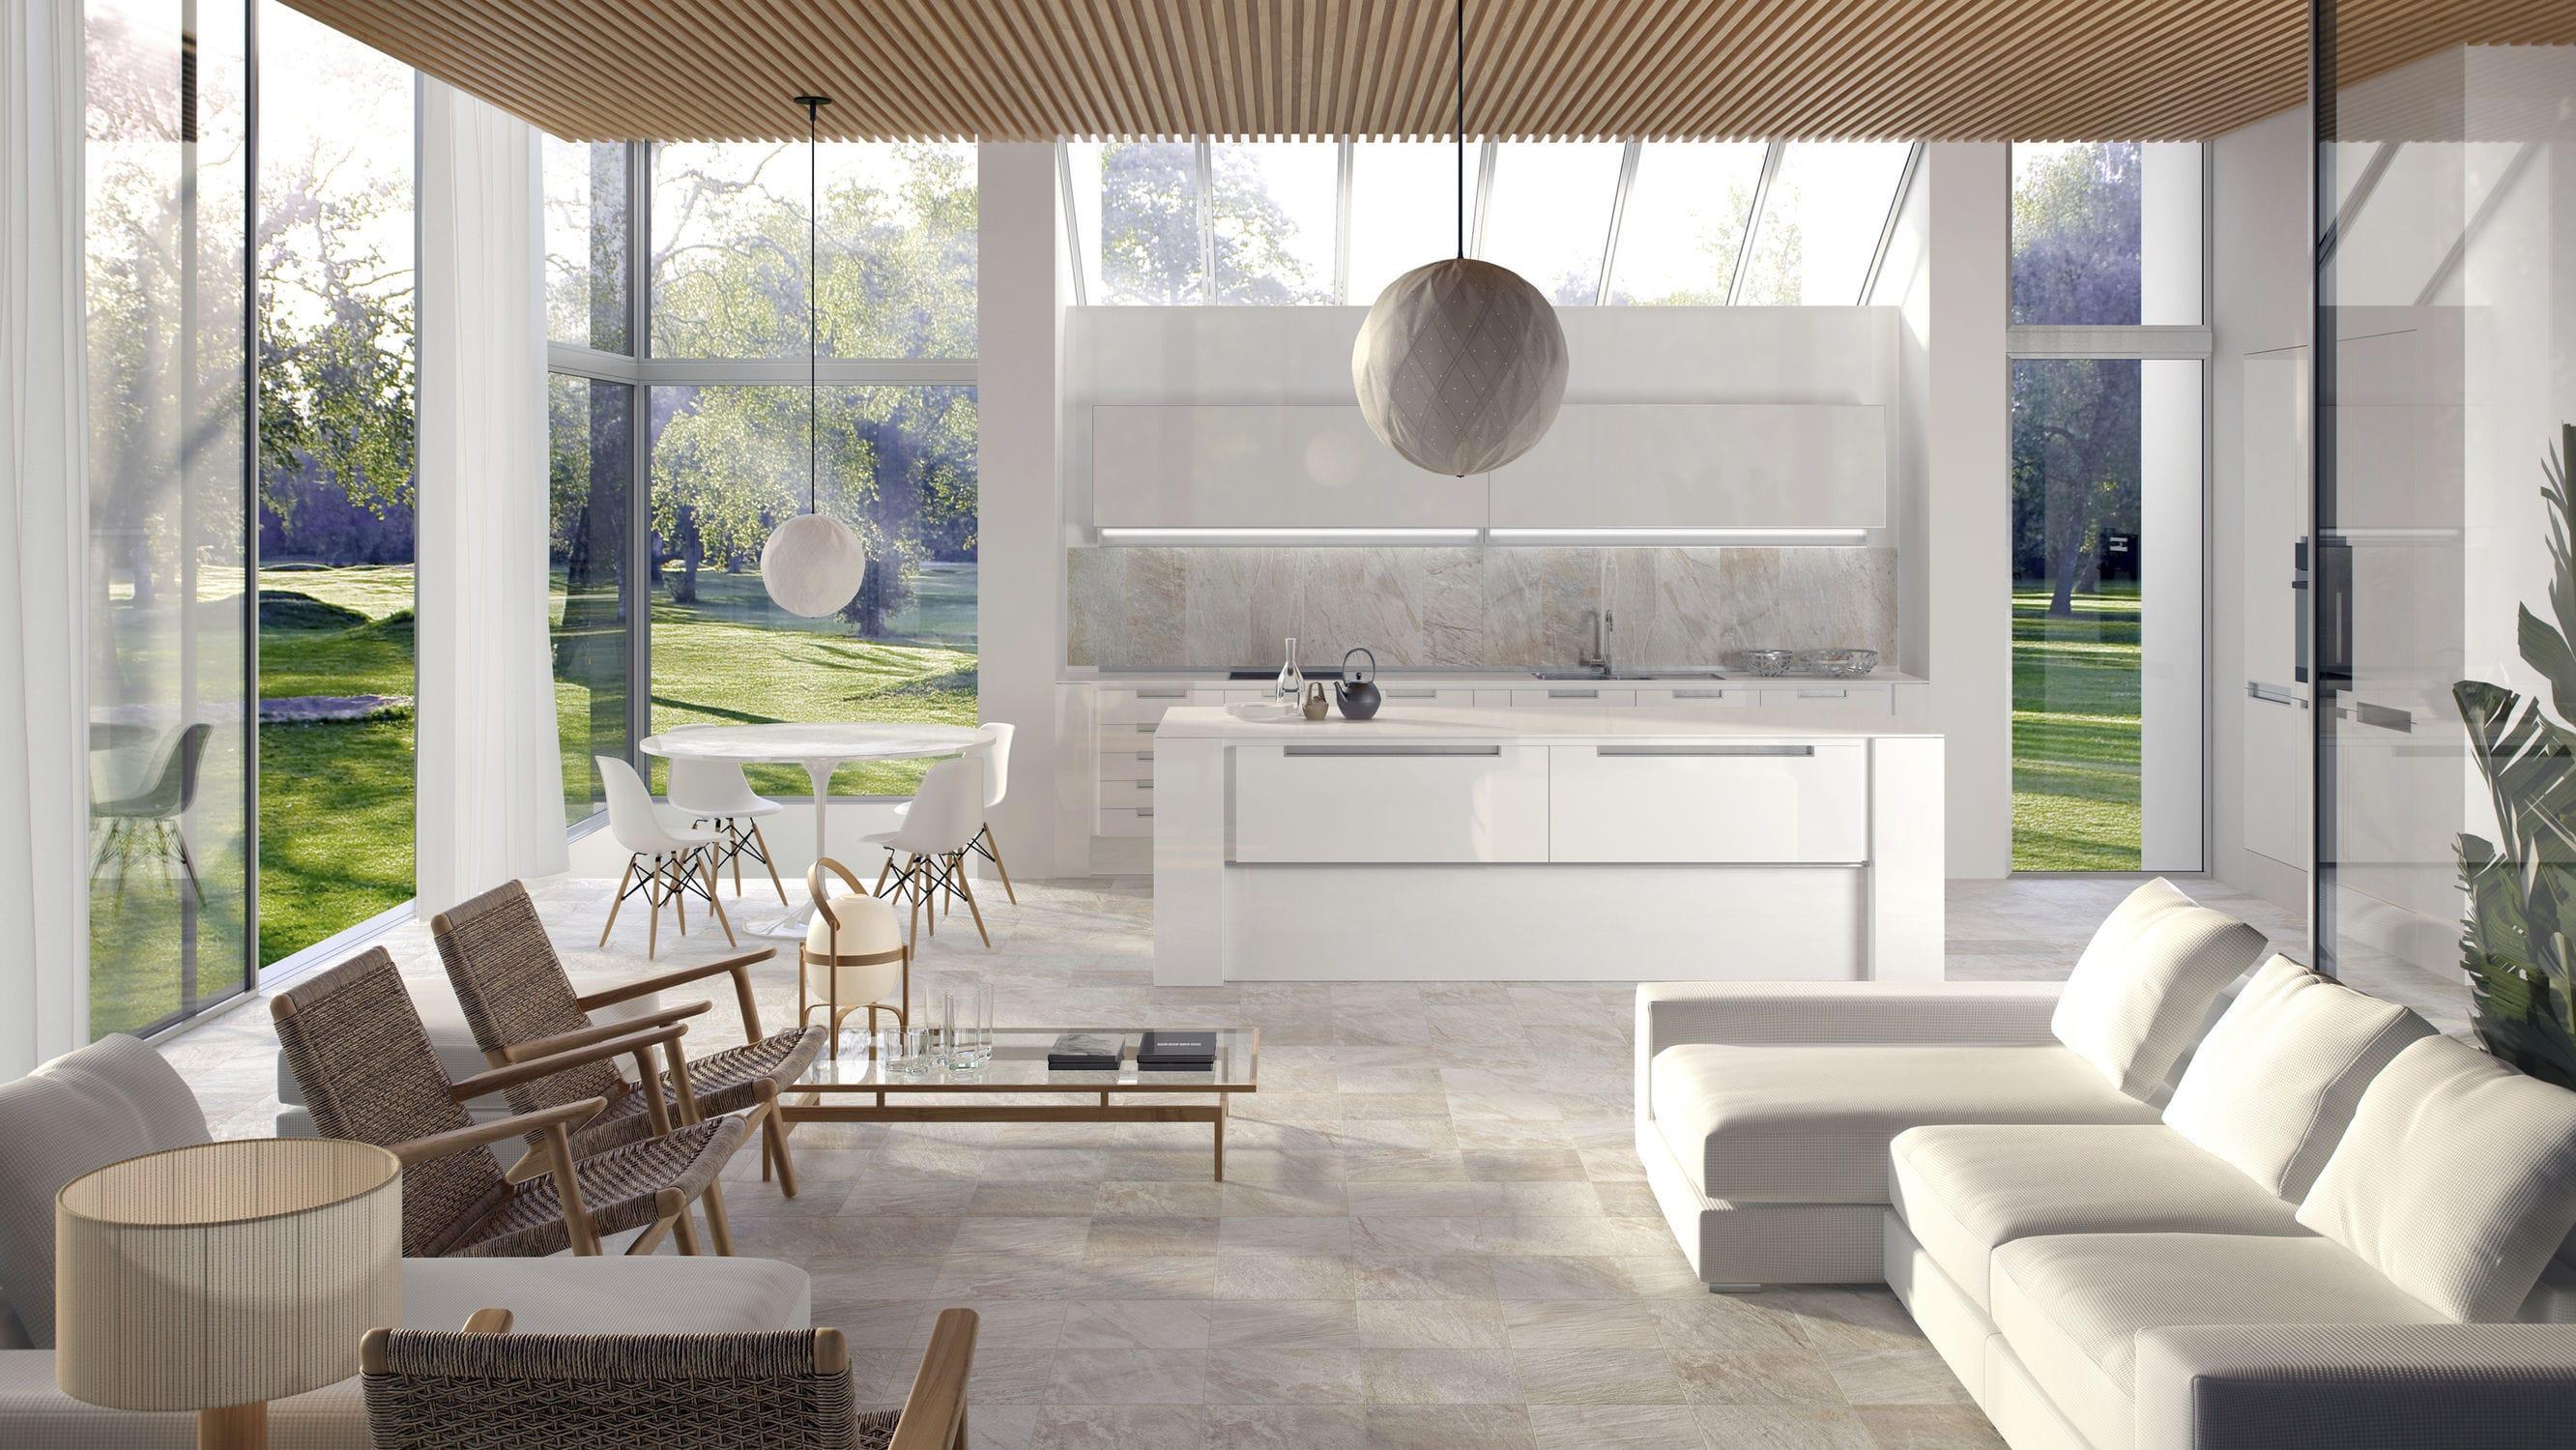 Living room tile / outdoor / floor / porcelain stoneware - GARLAND ...